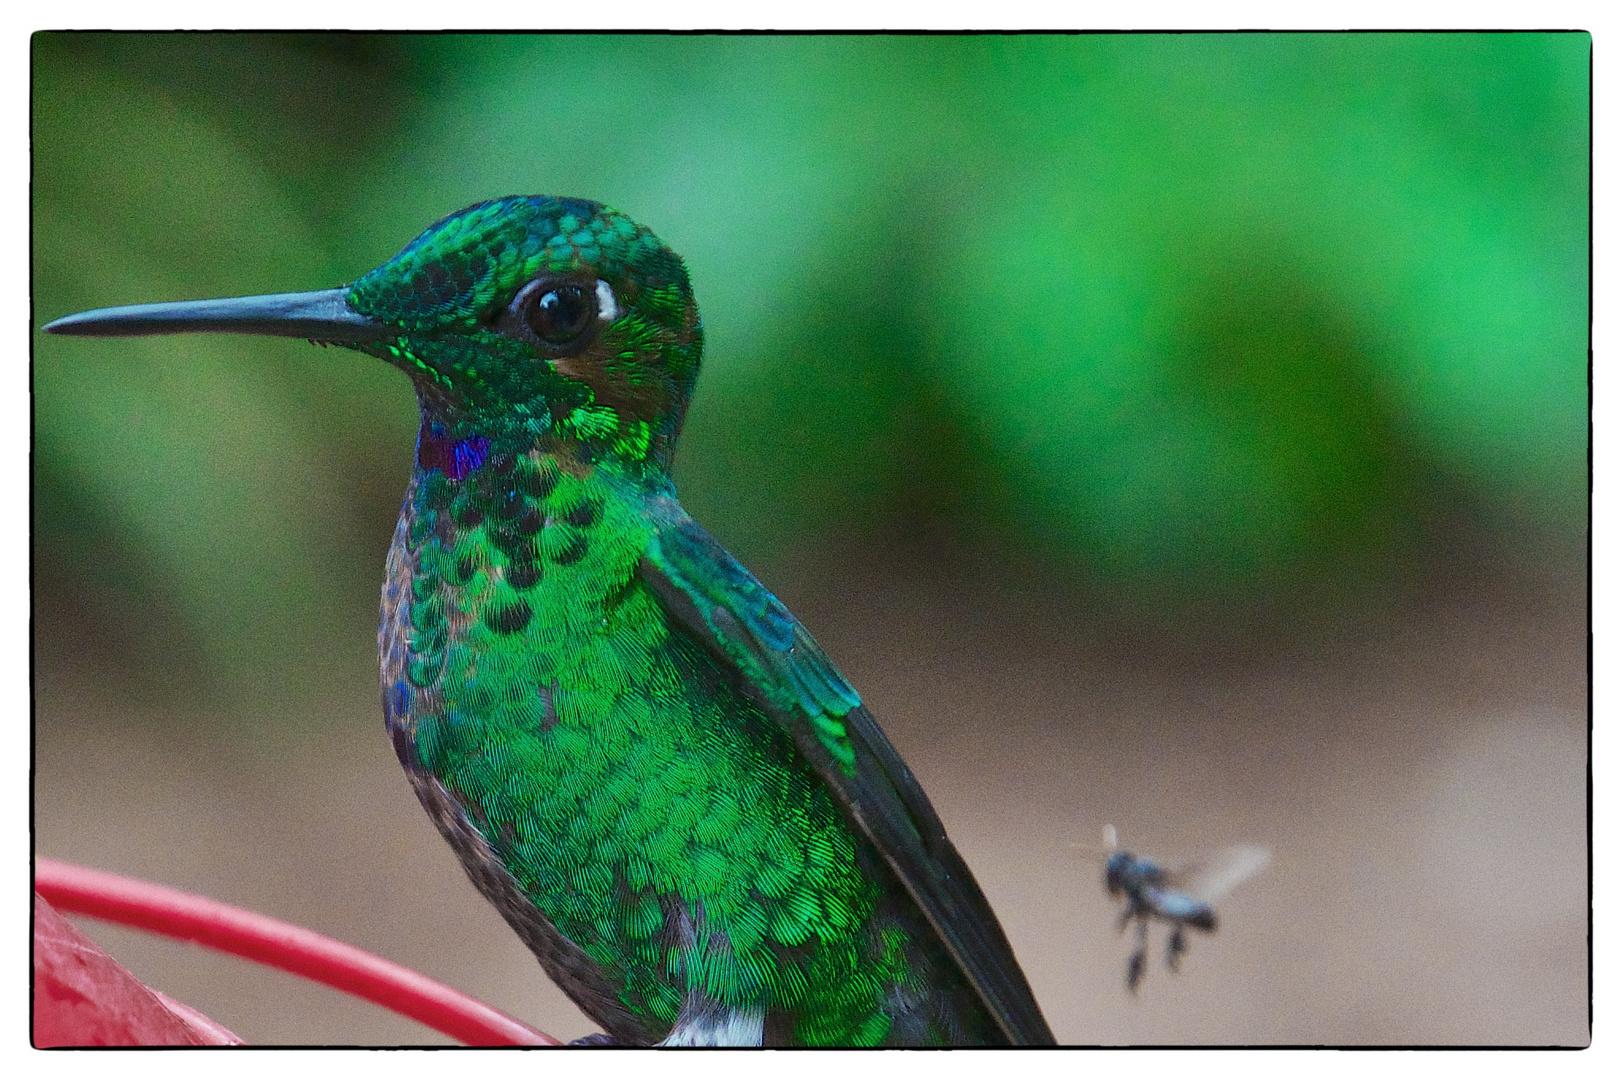 Hummingbird is looking at fly